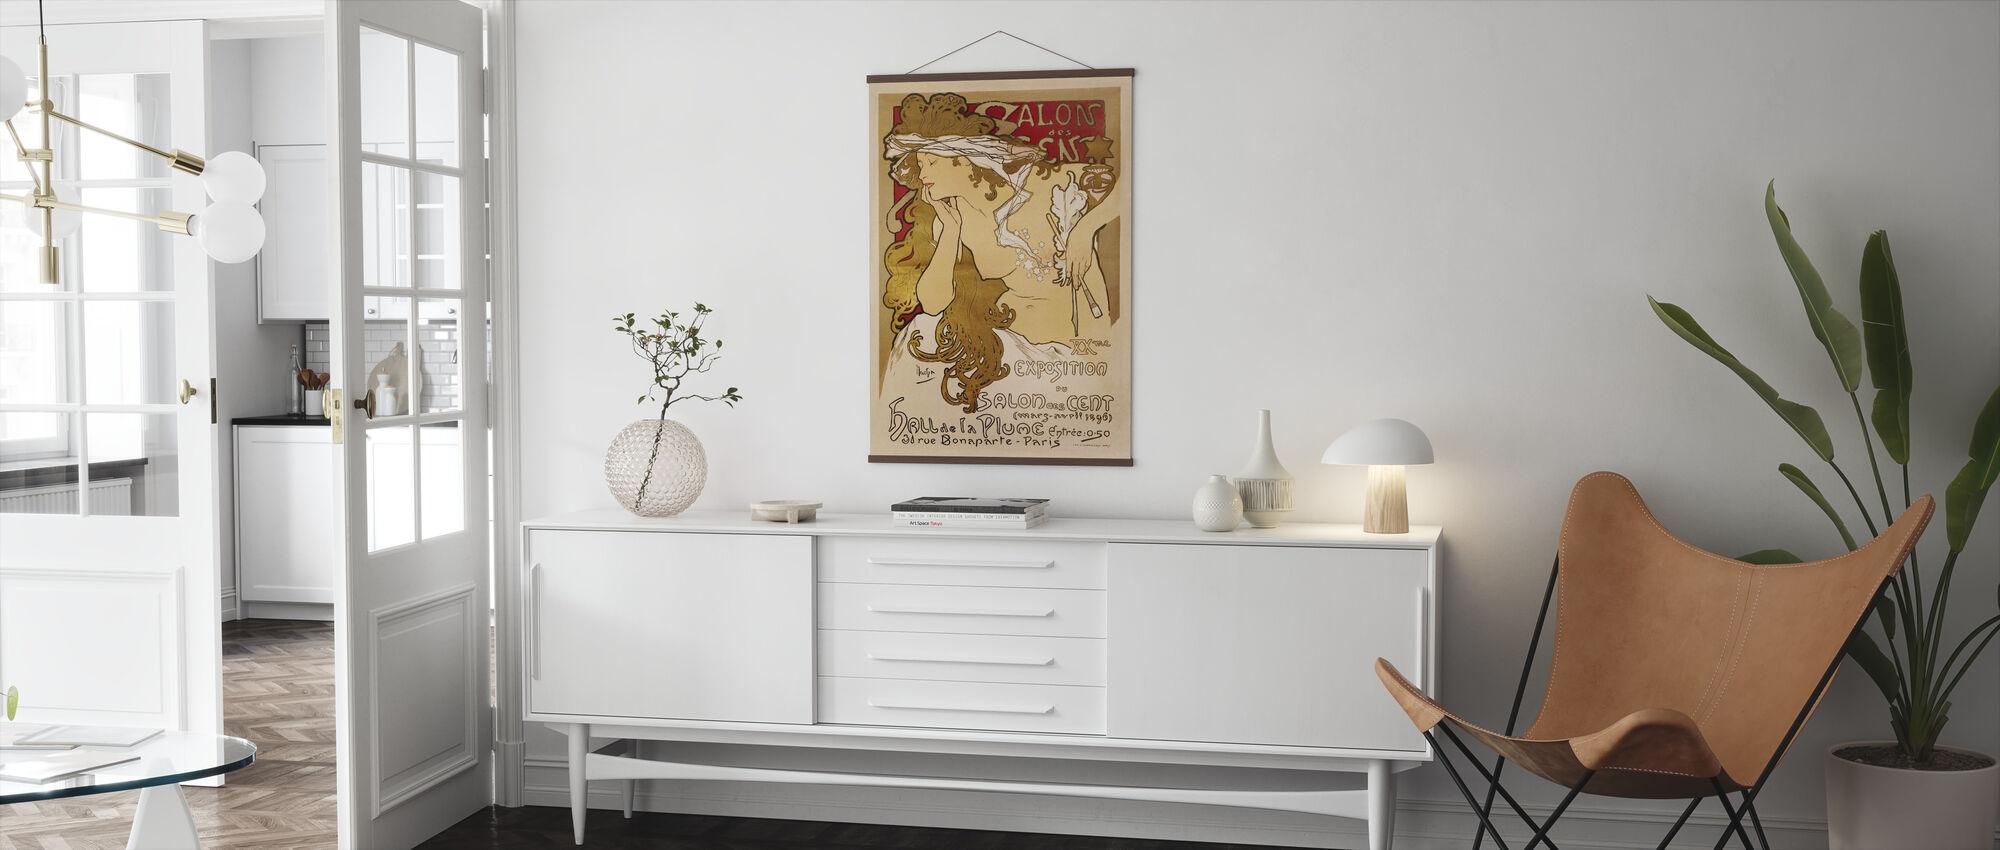 Alphonse Mucha - Salon des Cent - Poster - Living Room